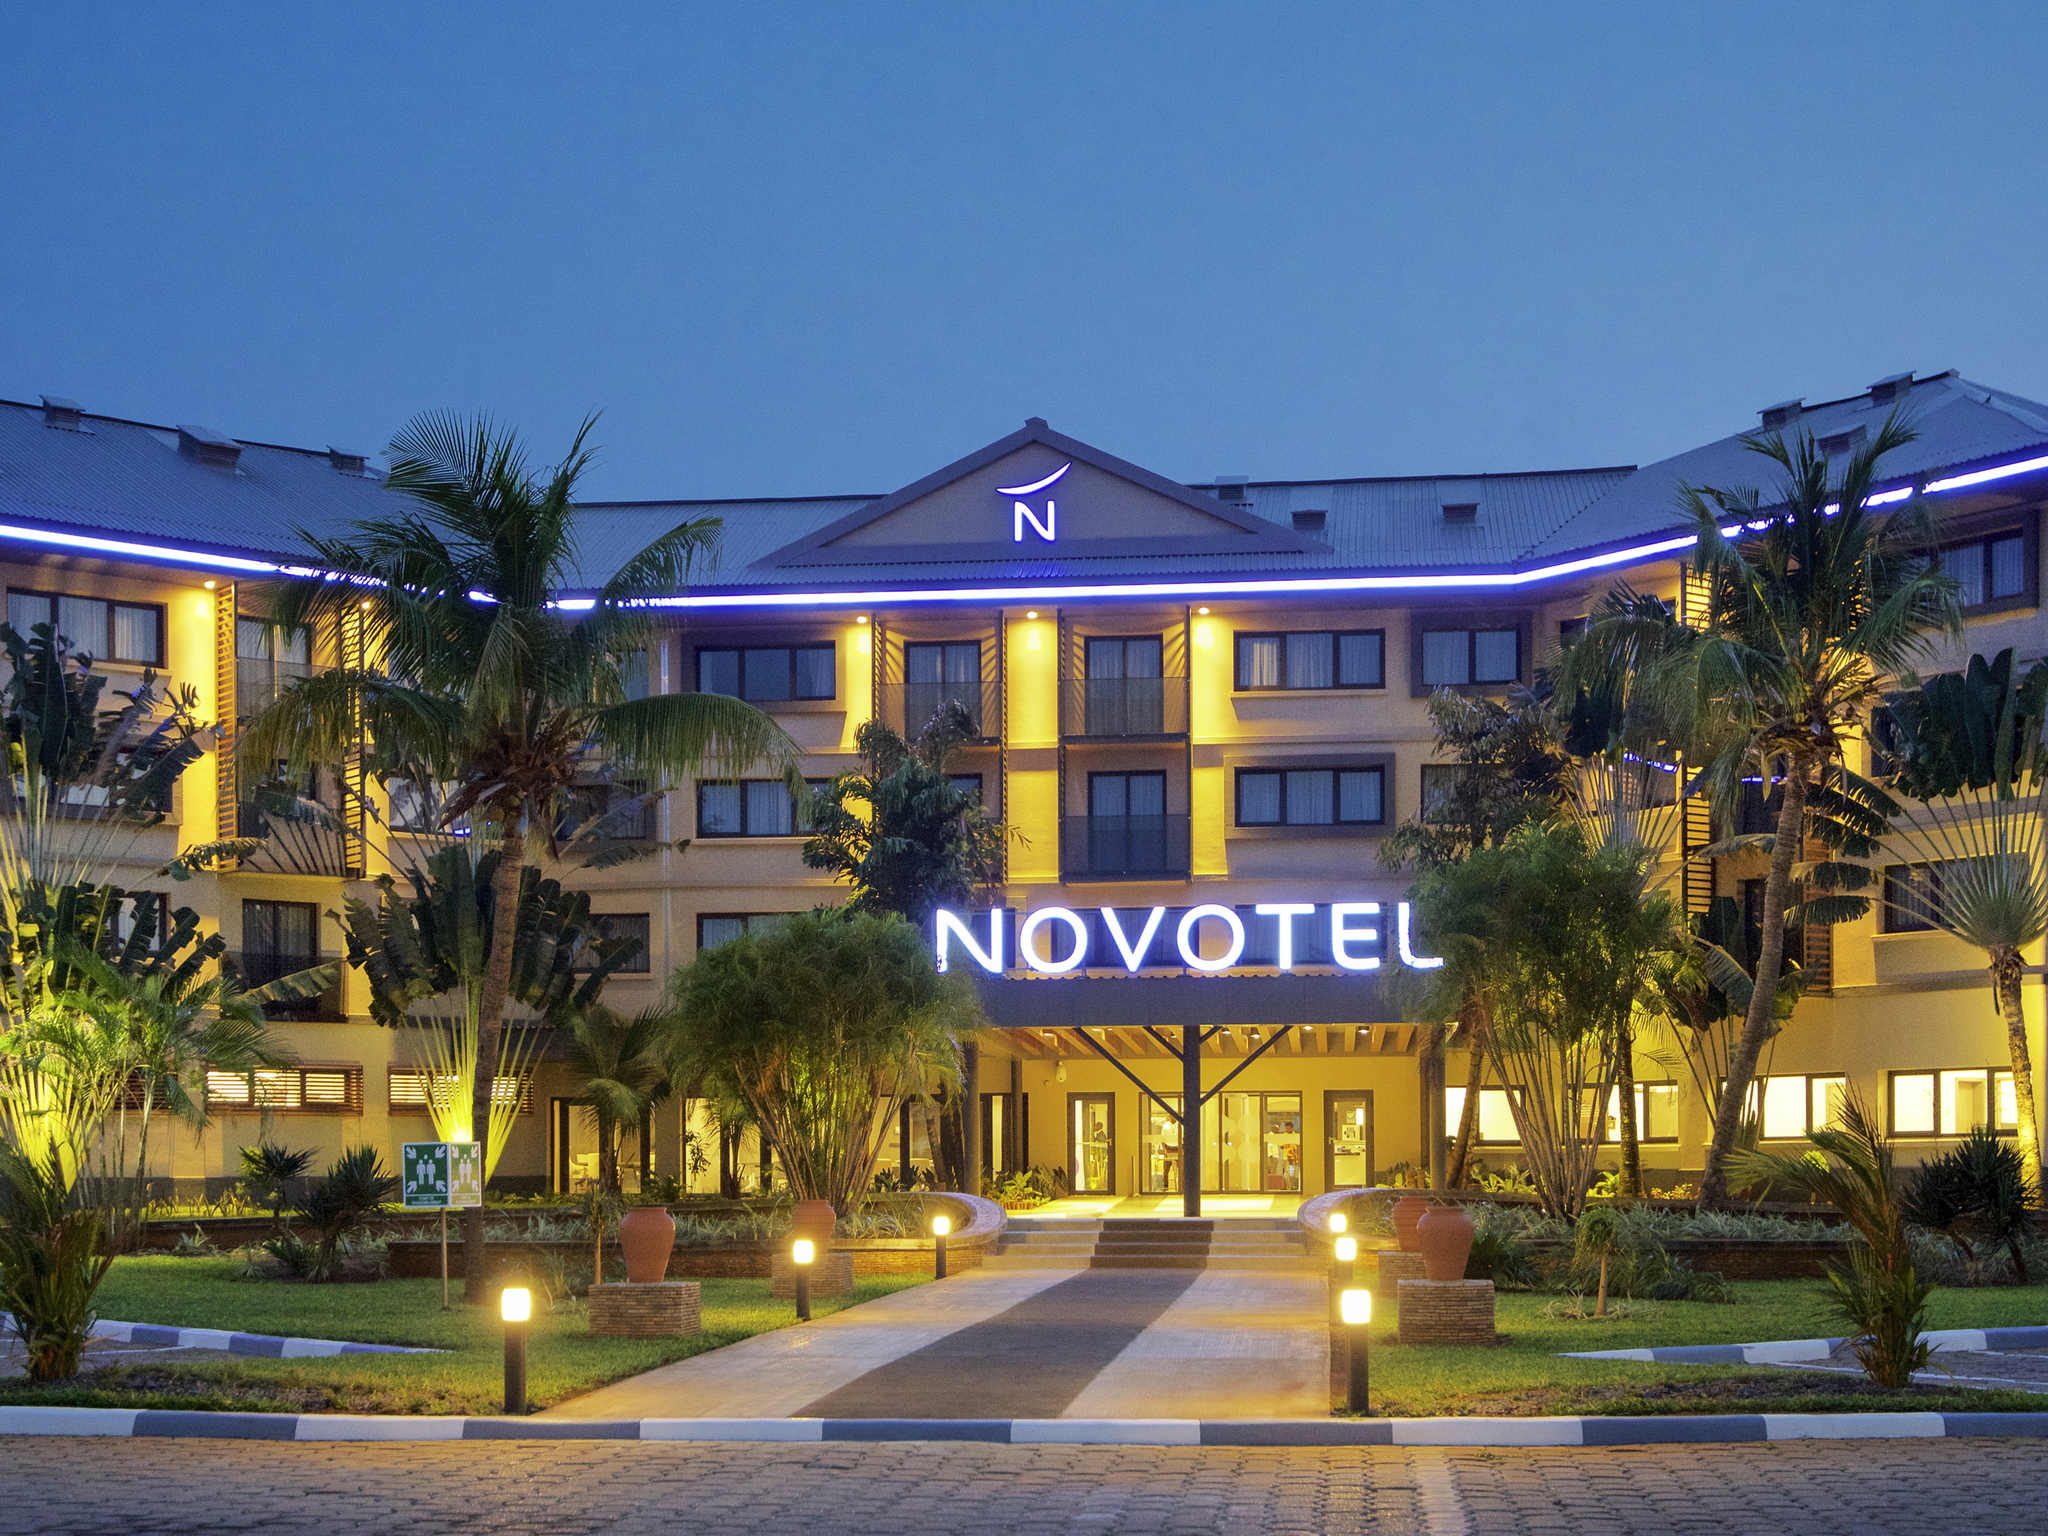 Hotel - Novotel Cotonou Orisha (Closed for refurbishment)